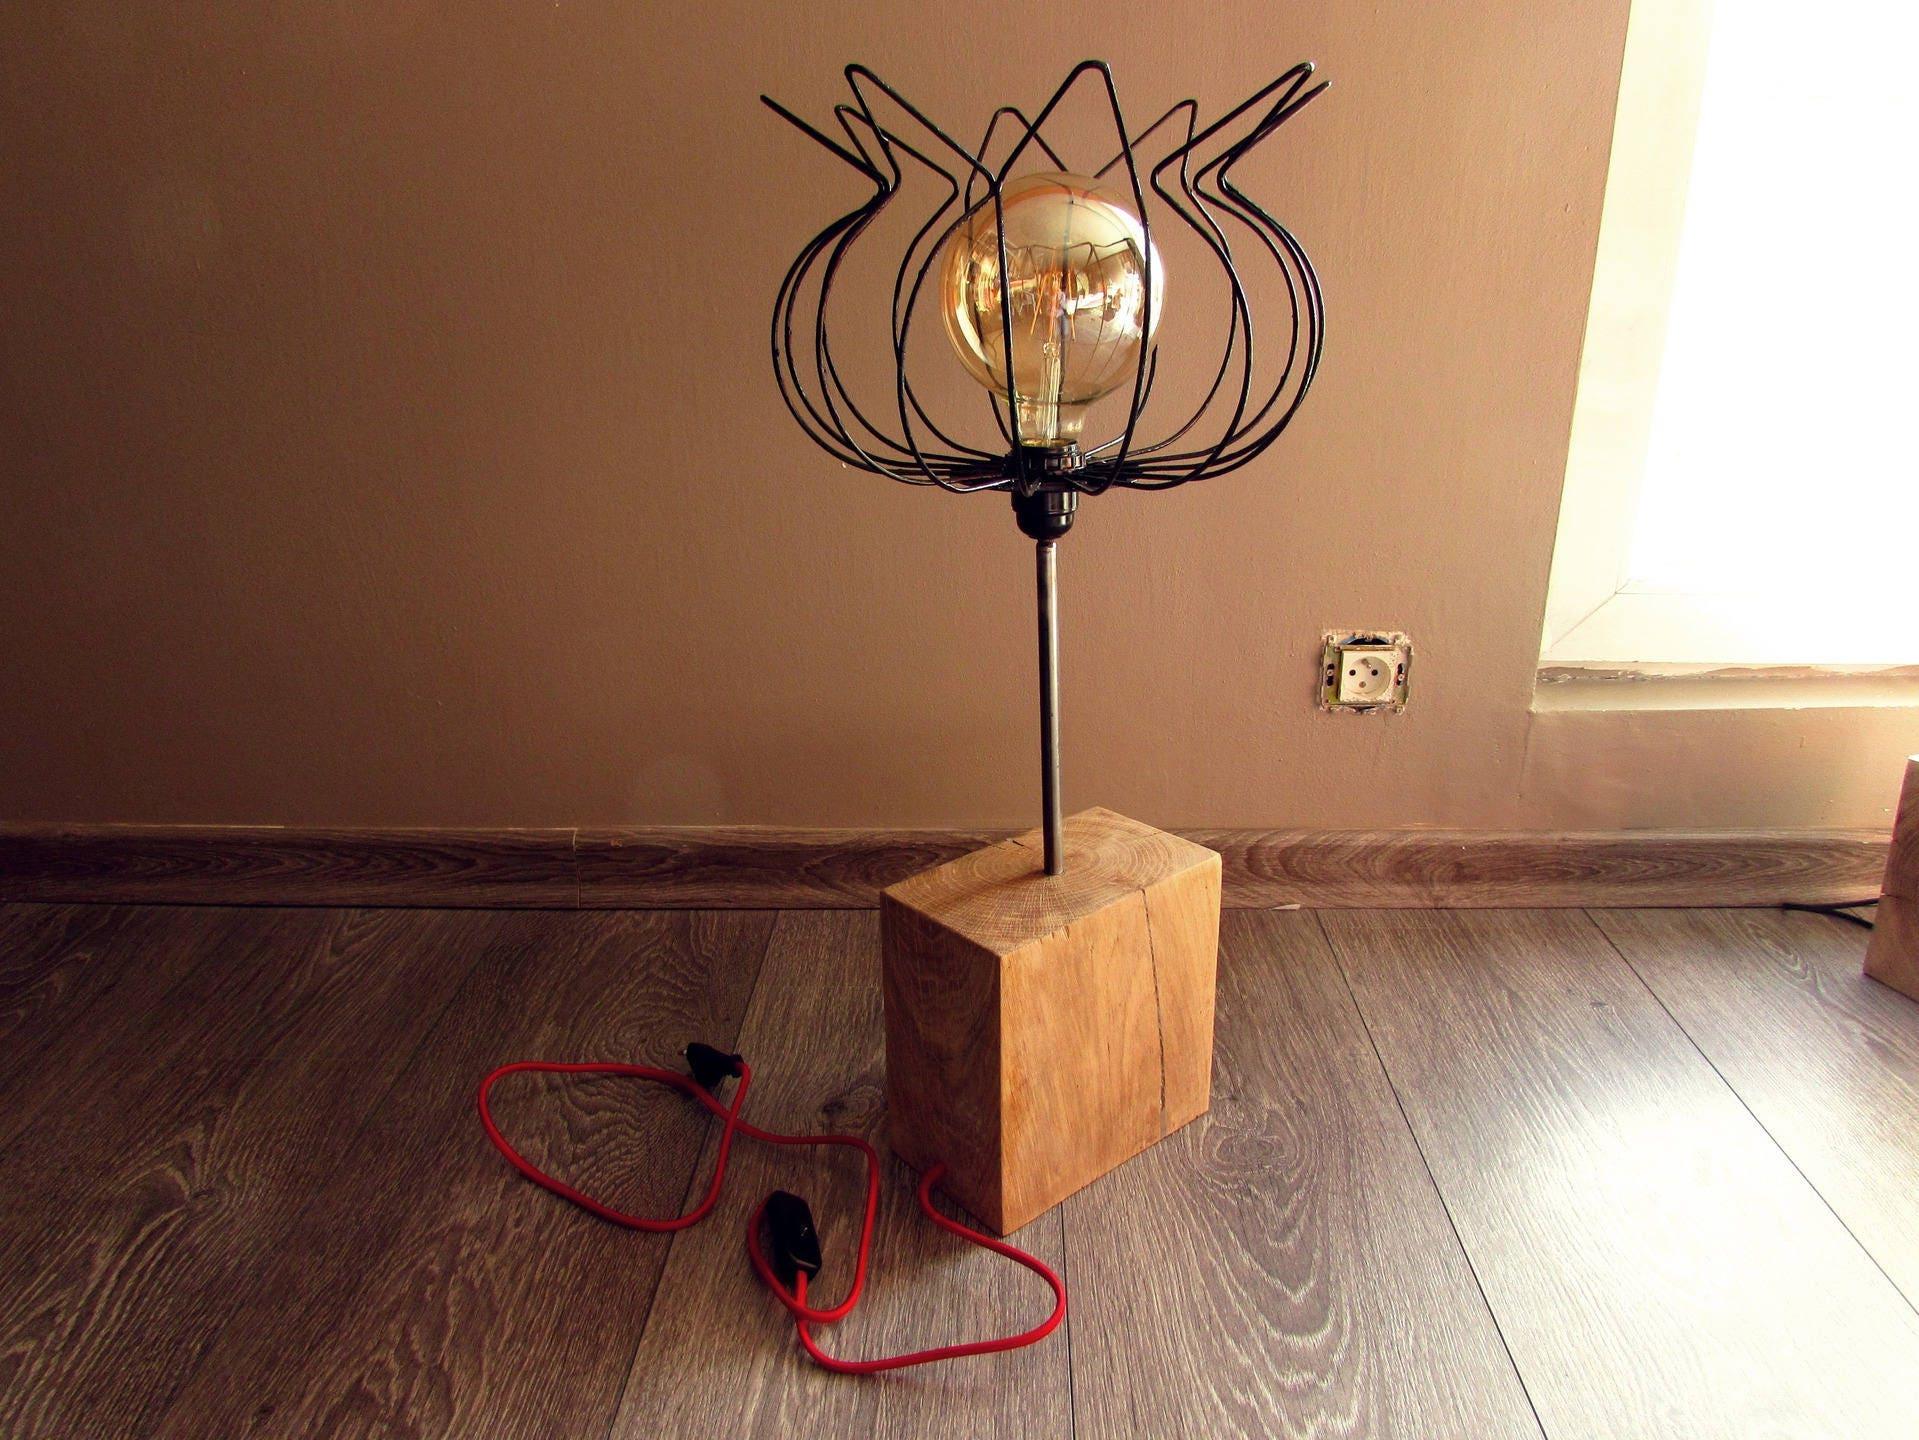 lampe pied en ch ne massif abat jour en fil de fer laqu noir. Black Bedroom Furniture Sets. Home Design Ideas